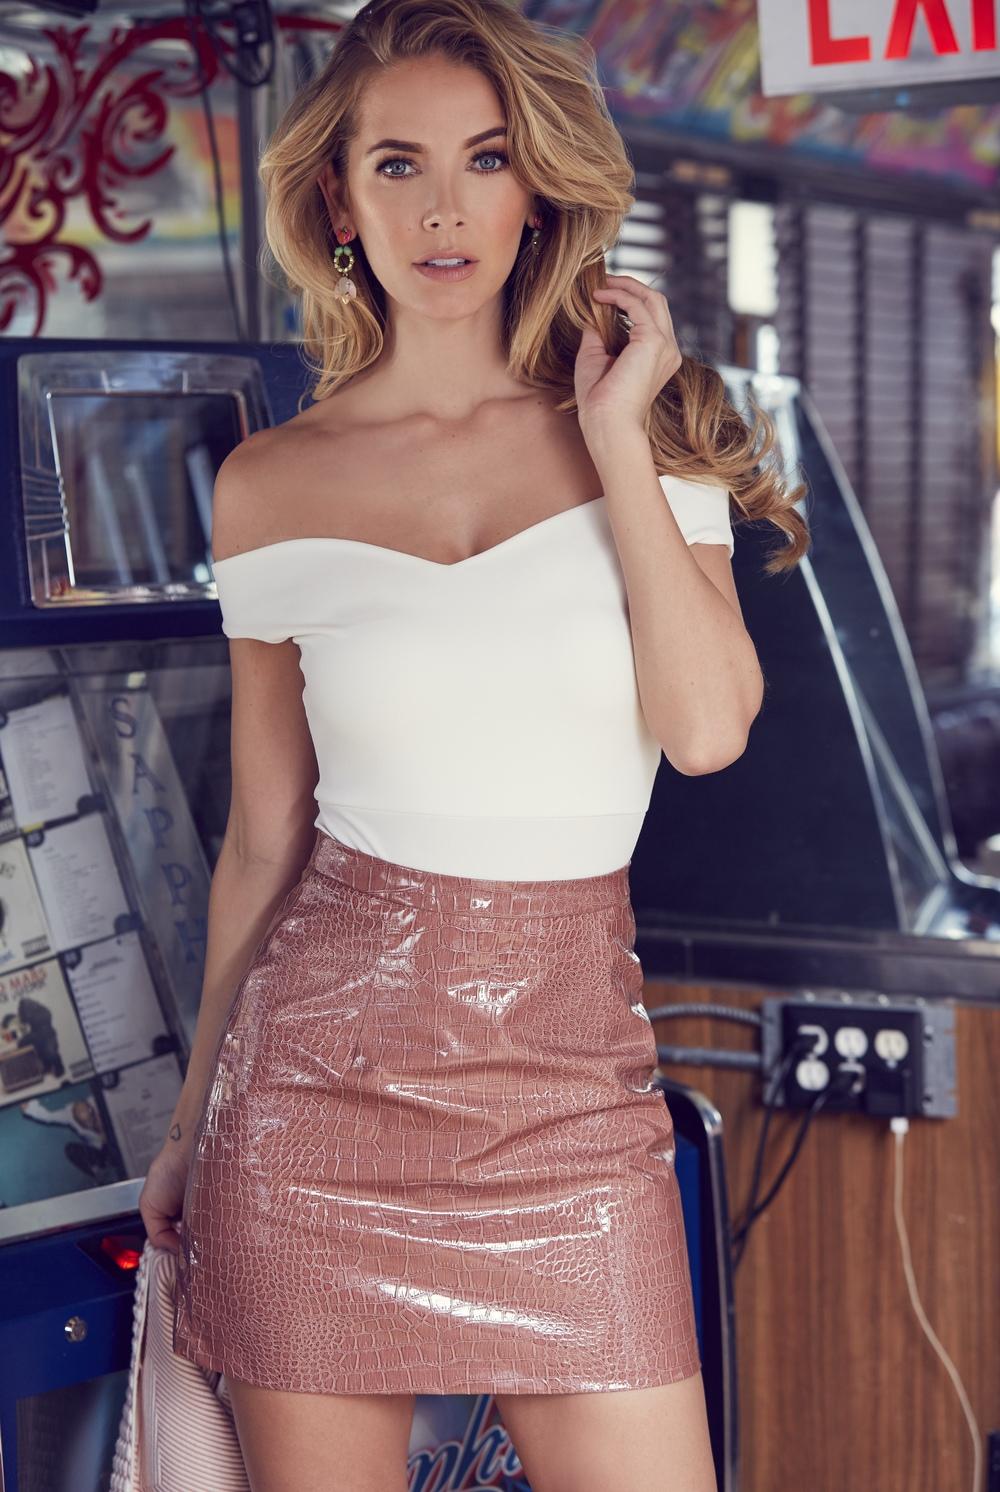 GALORE Magazine - Olivia Jordan (Miss USA)